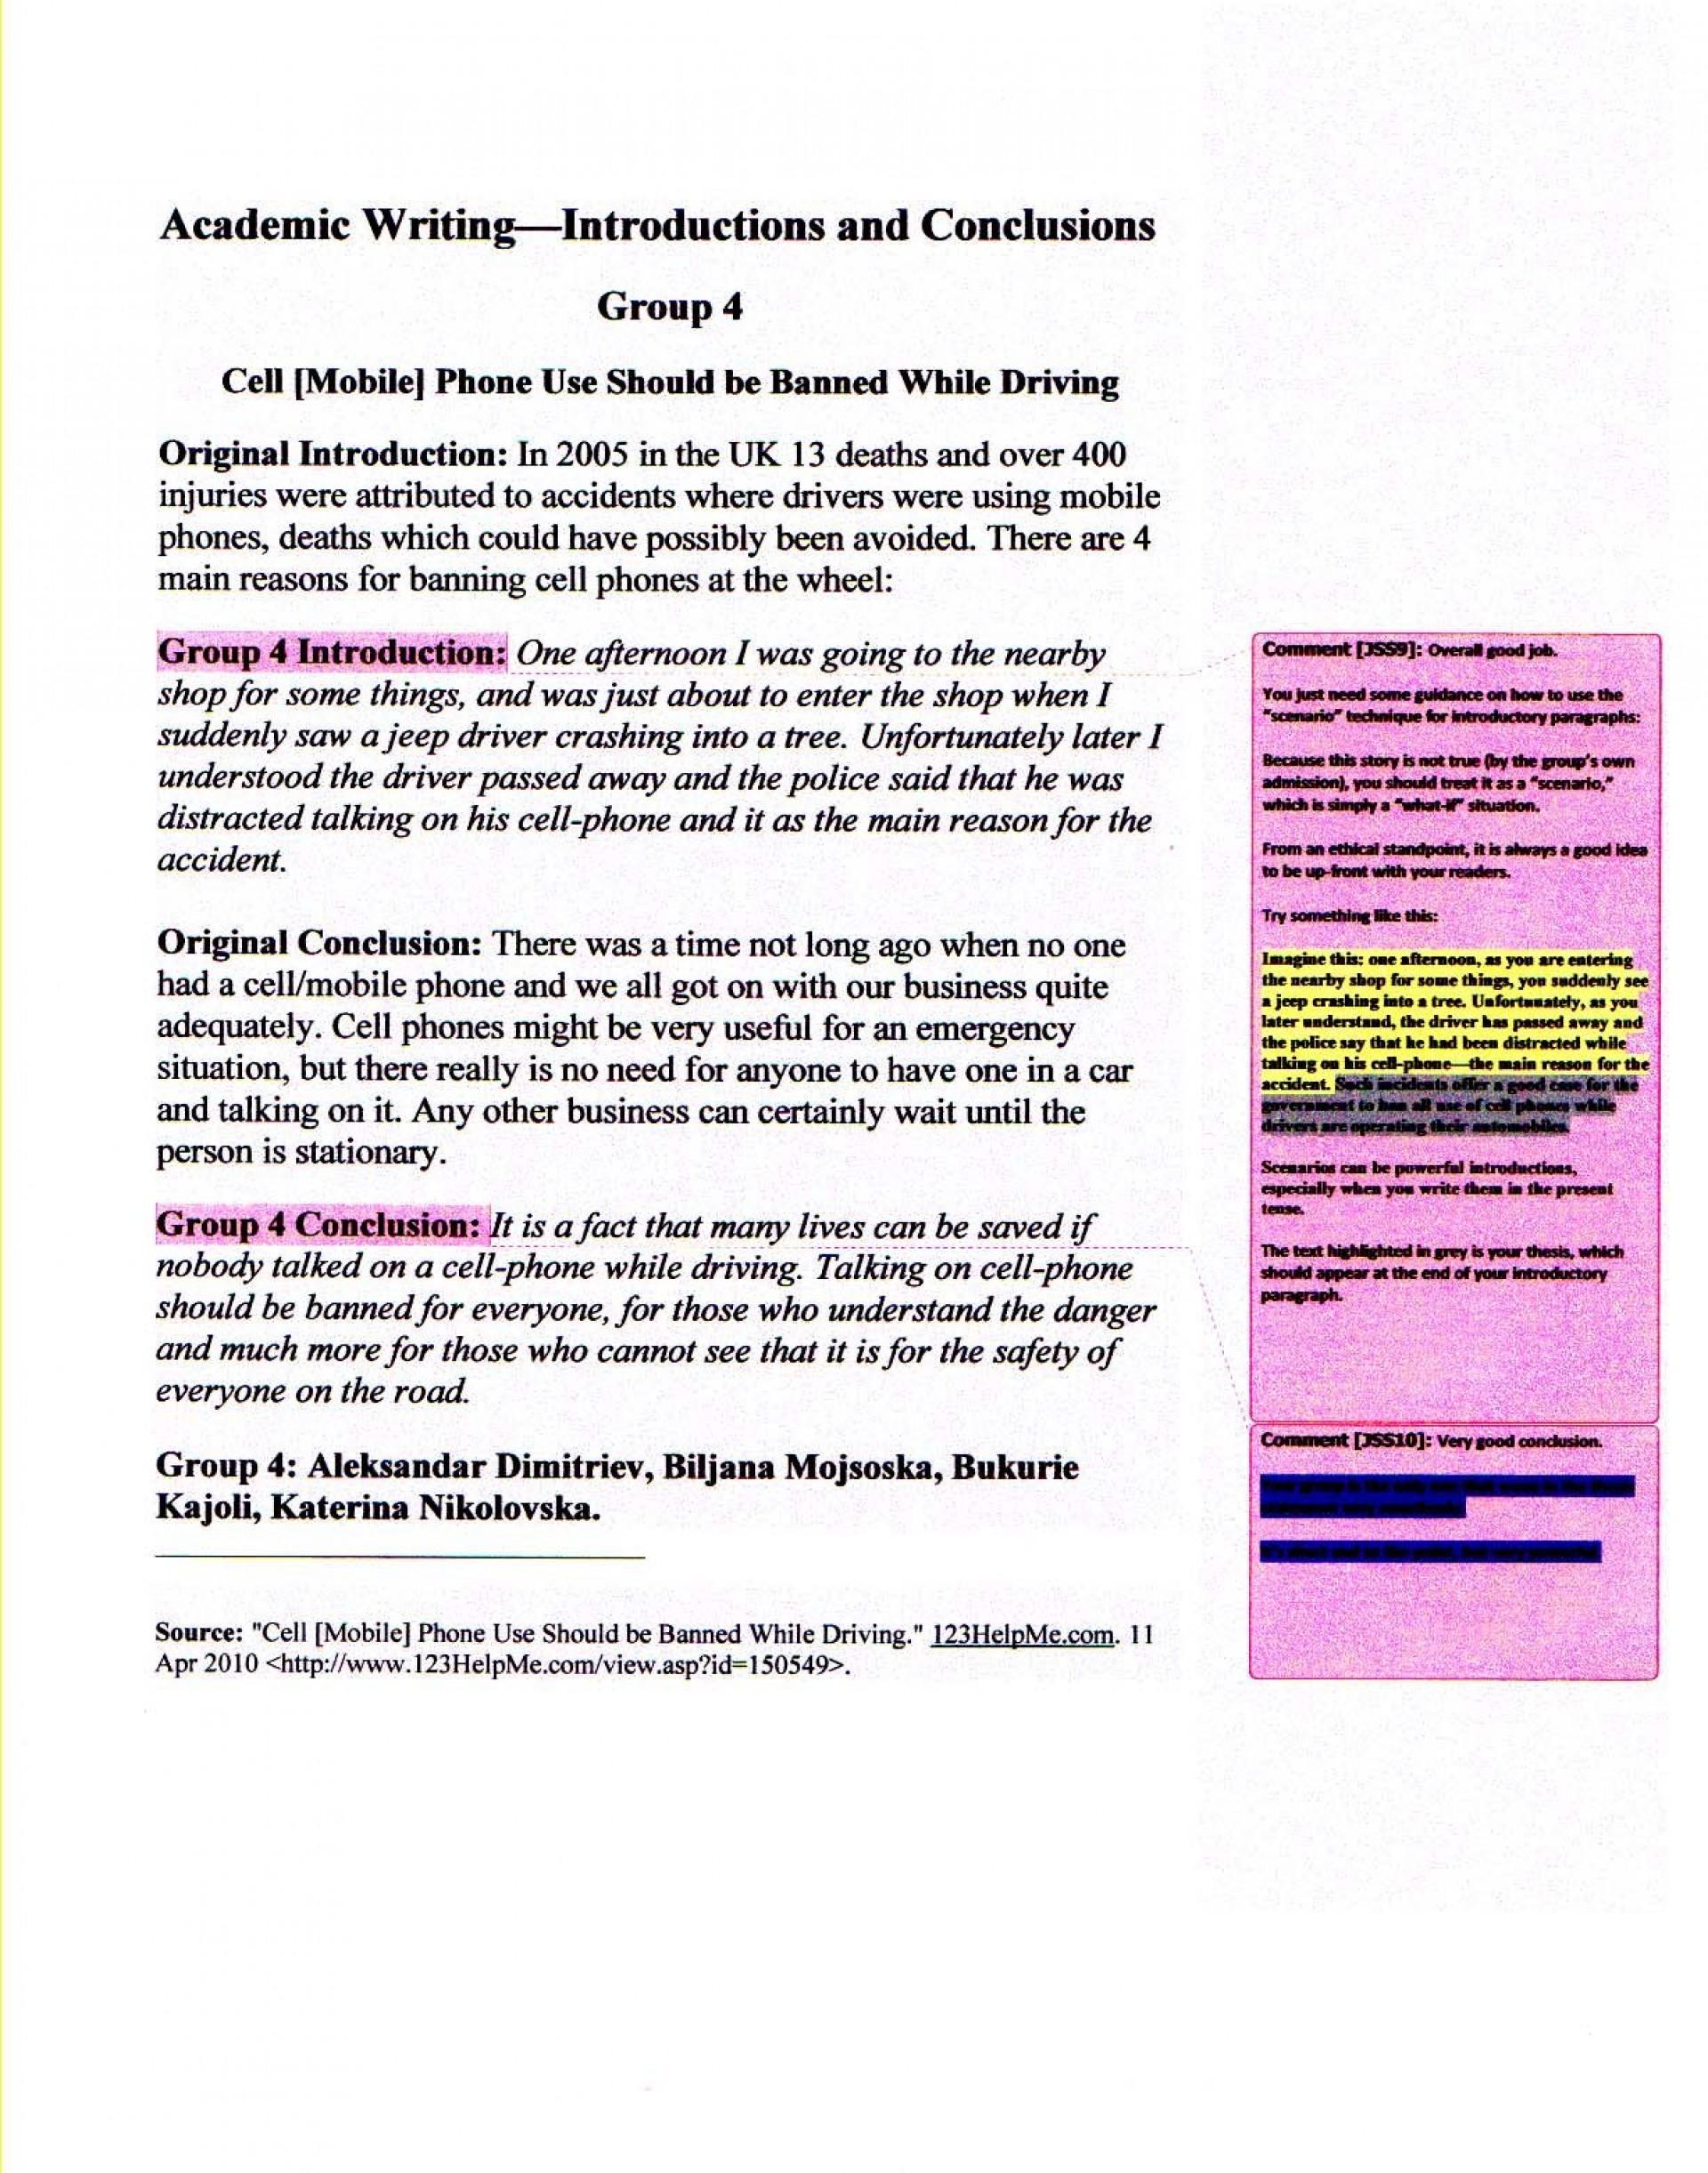 006 Persuasive Essay Conclusion Impressive Paragraph Examples Structure 1920